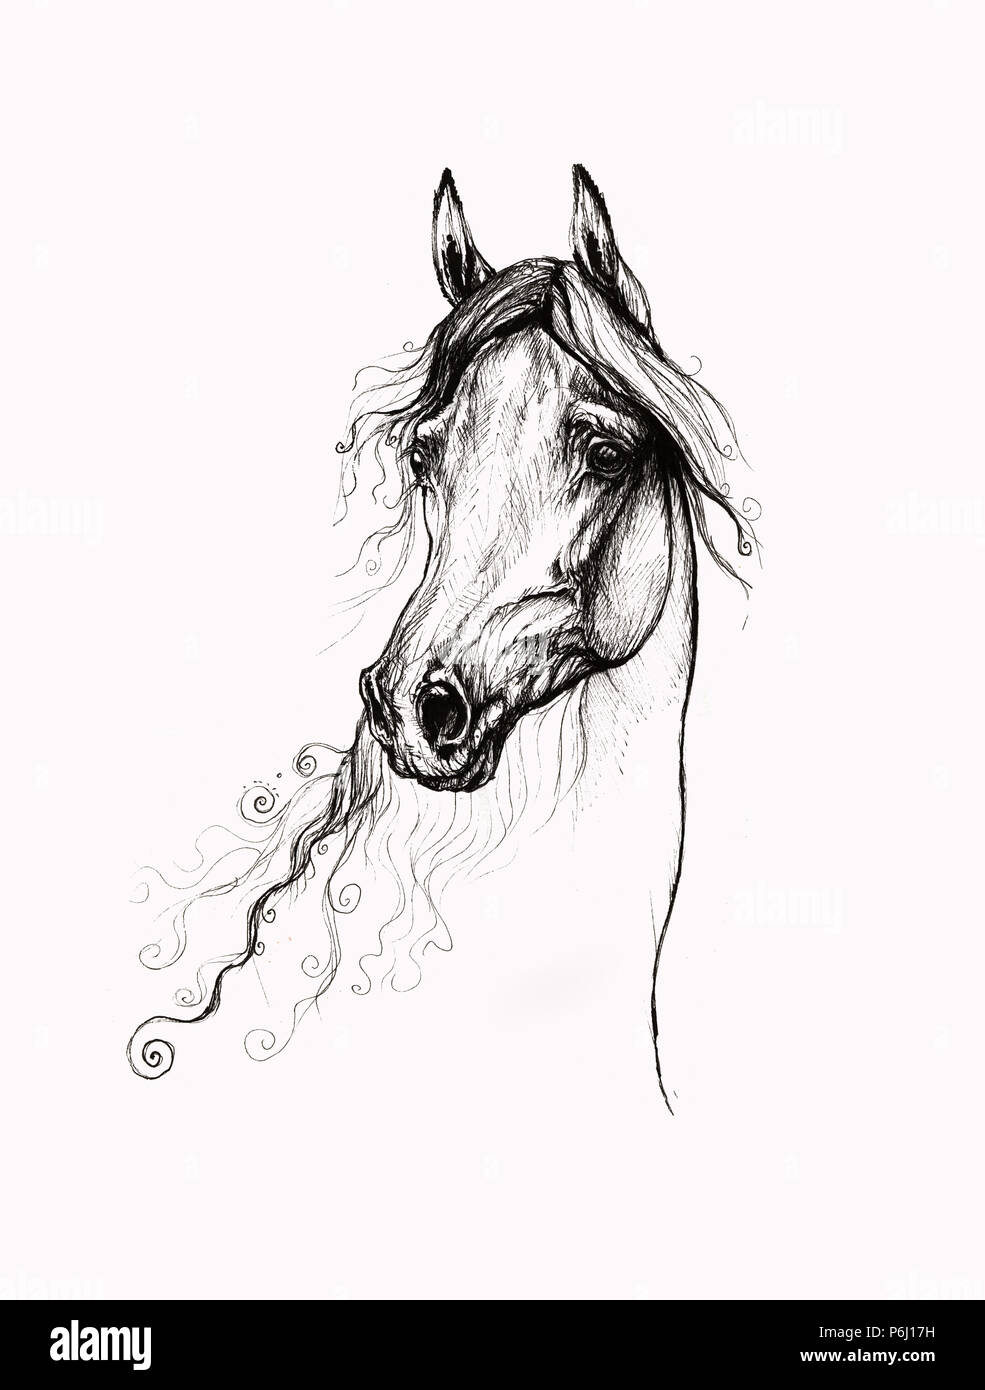 Arabian Horse Portrait Drawing Stock Photo Alamy